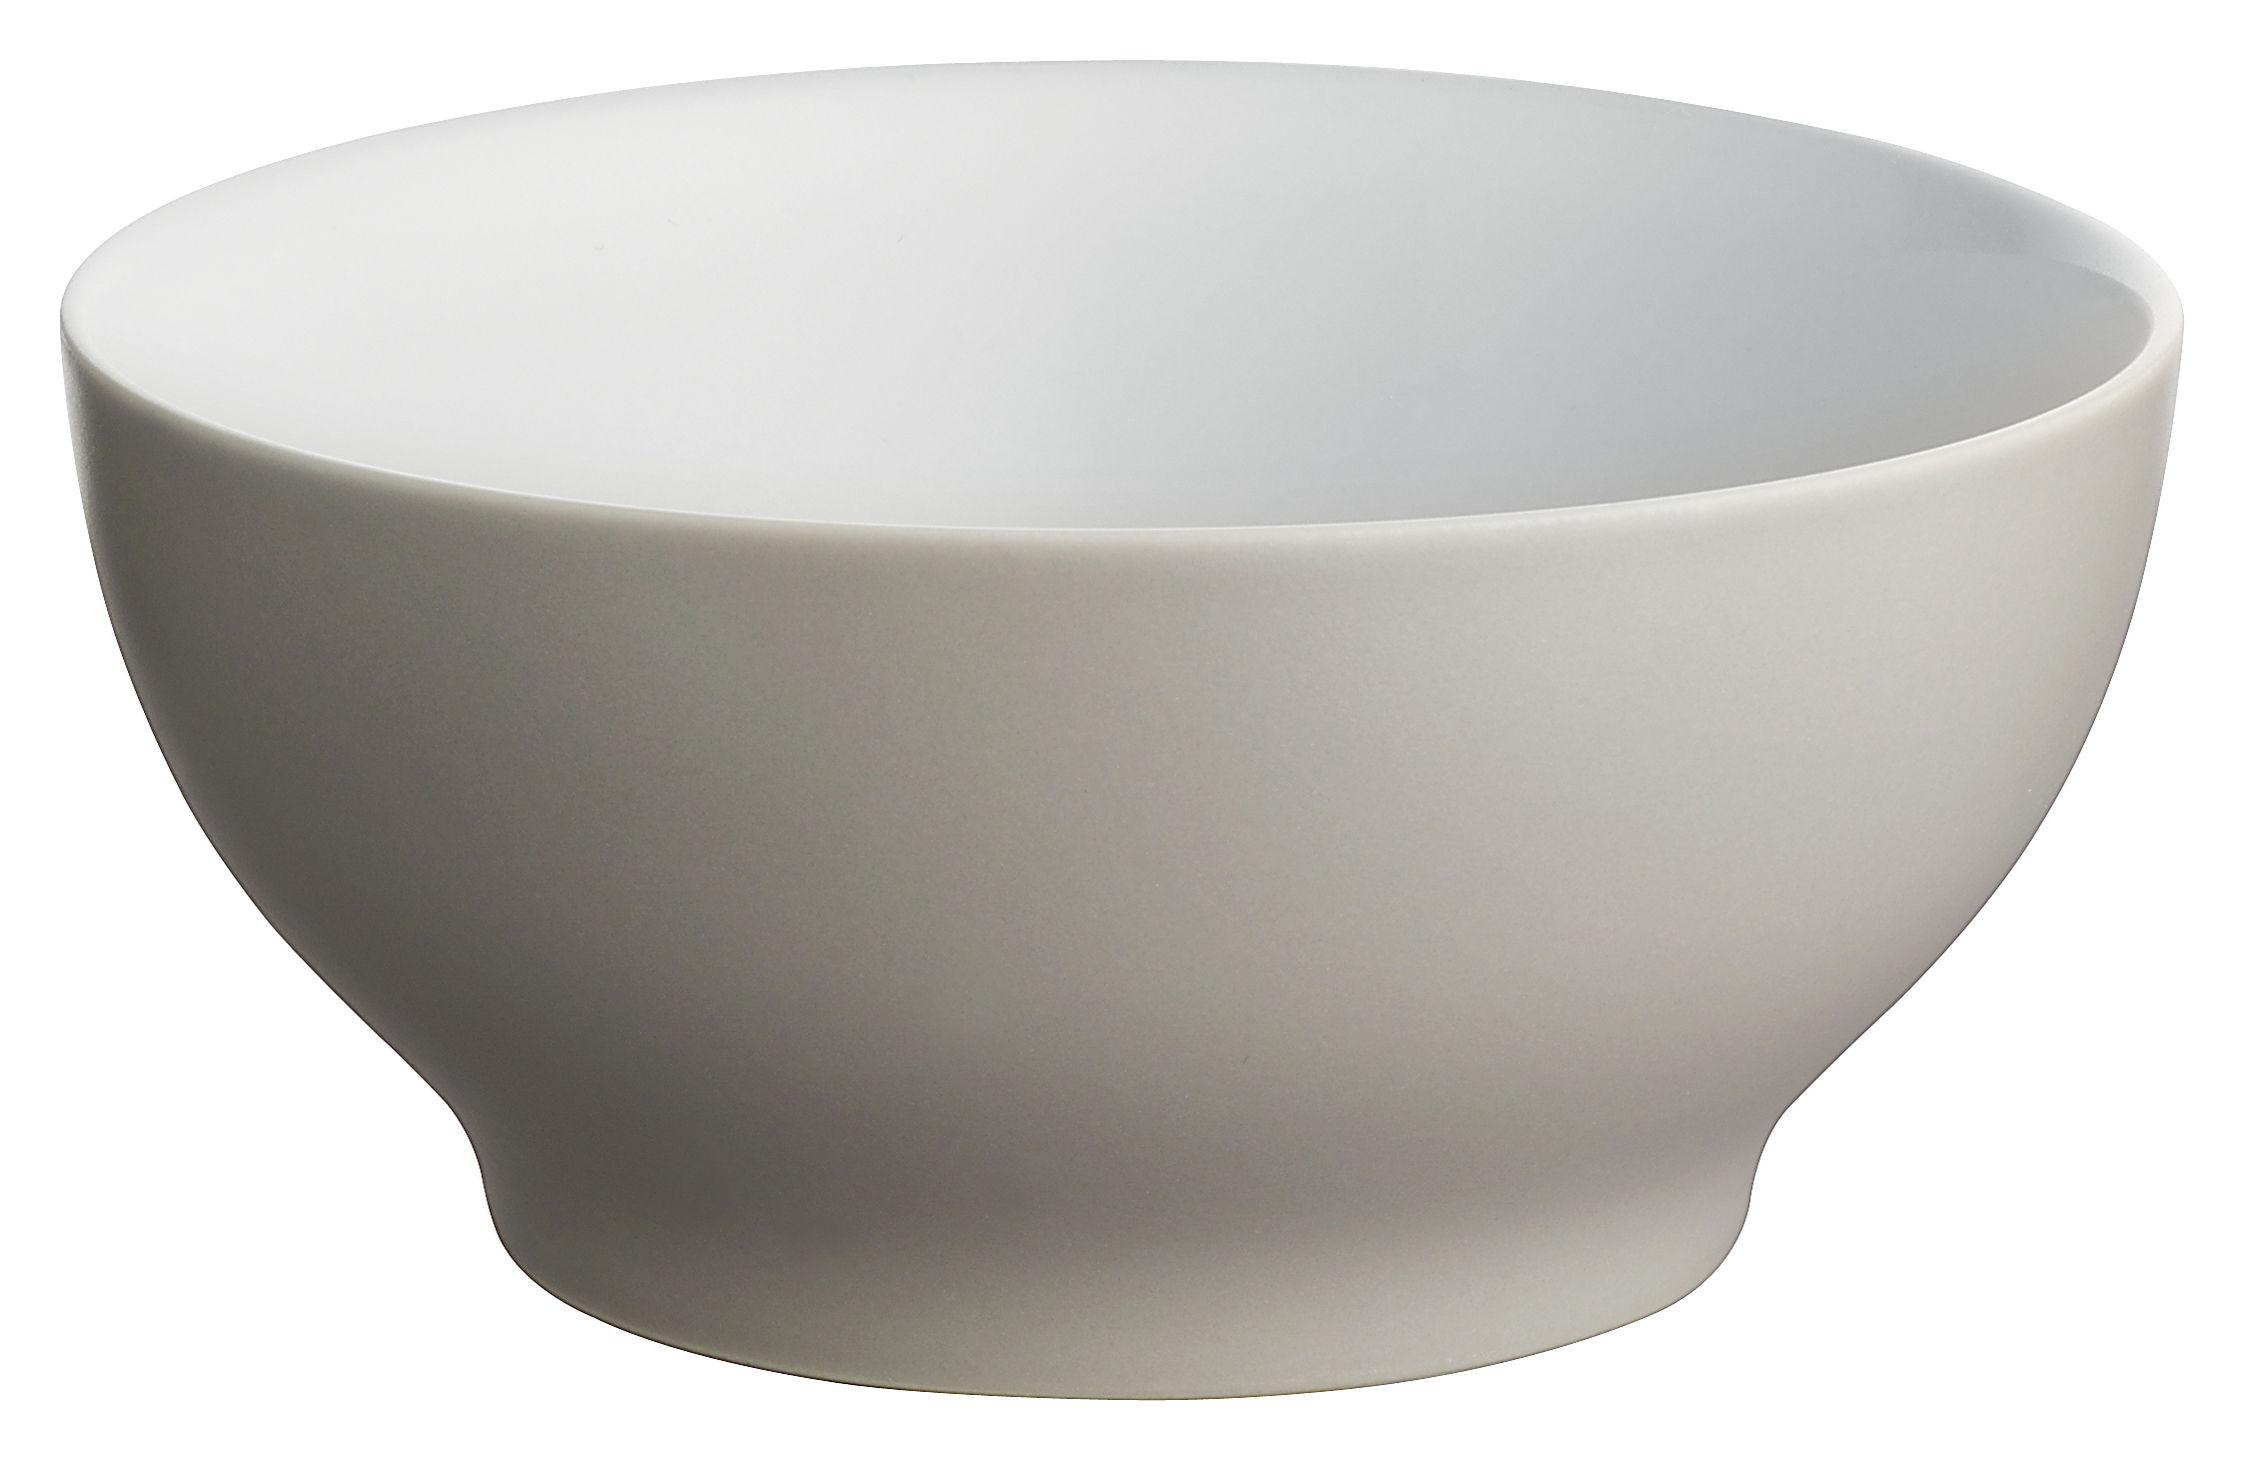 Tableware - Bowls - Tonale Bowl - Small bowl by Alessi - Light grey - Stoneware ceramic